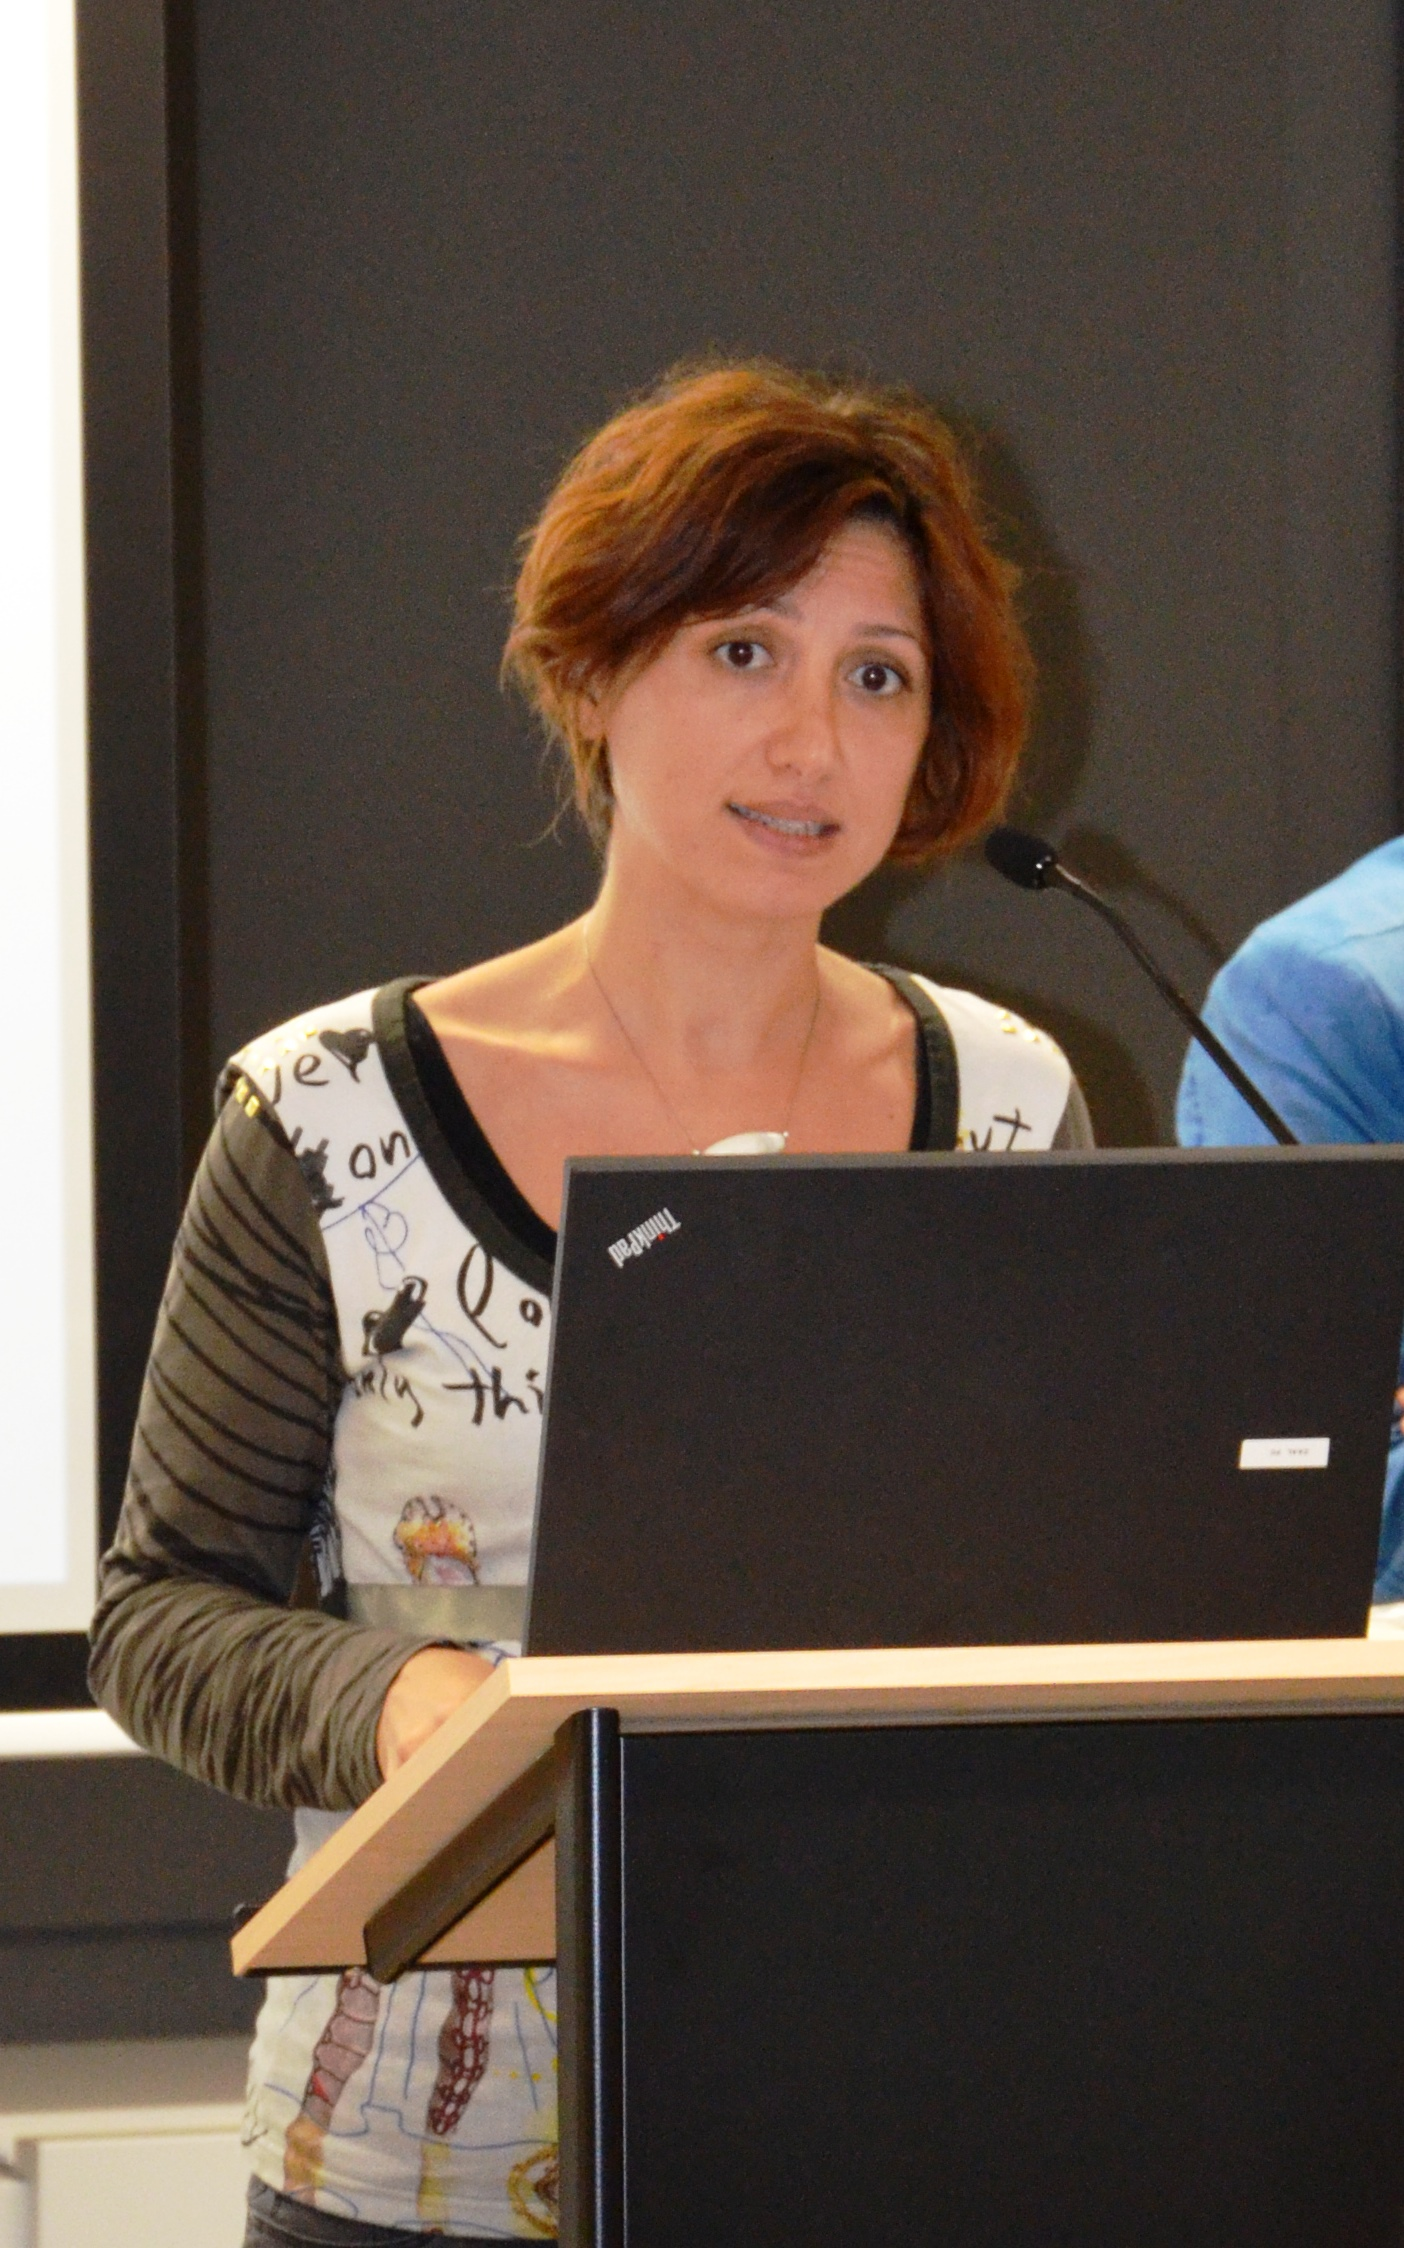 Caterina Cortese